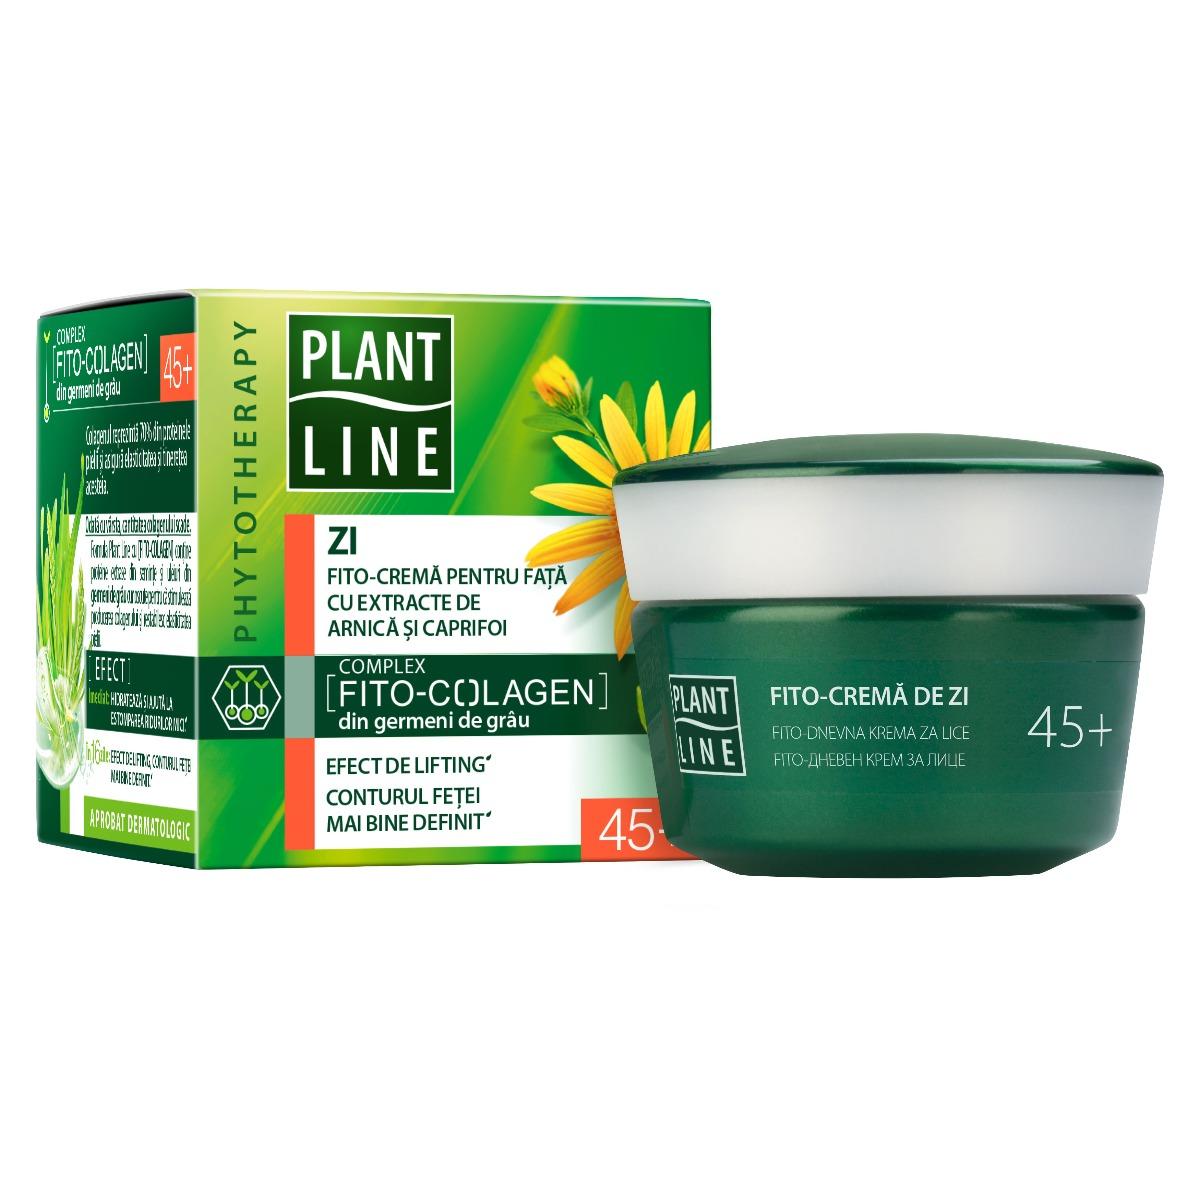 Crema de zi Plant Line Arnica, 45+, 45 ml imagine